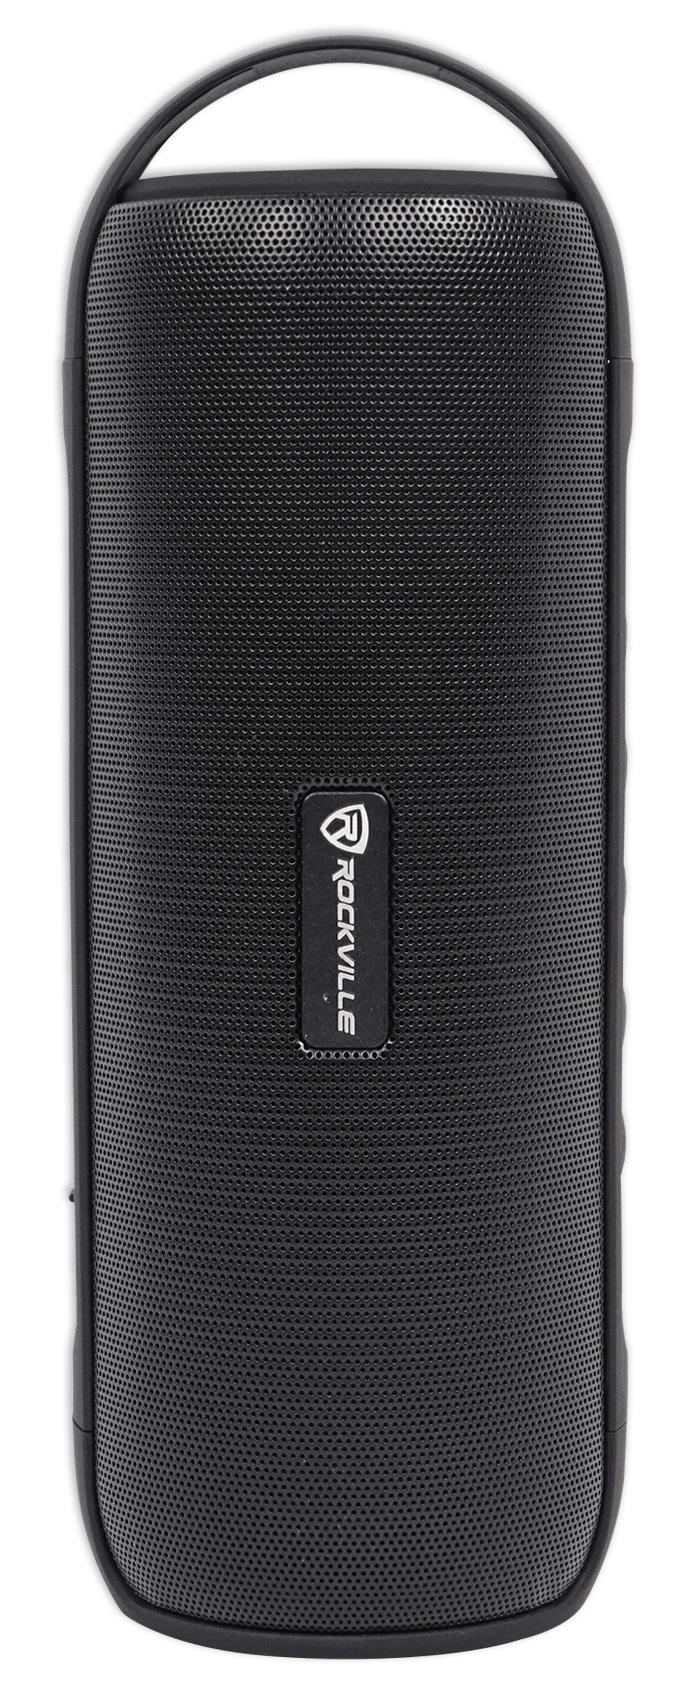 Amazon.com: Rockville RPB25 40 Watt Portable/Outdoor